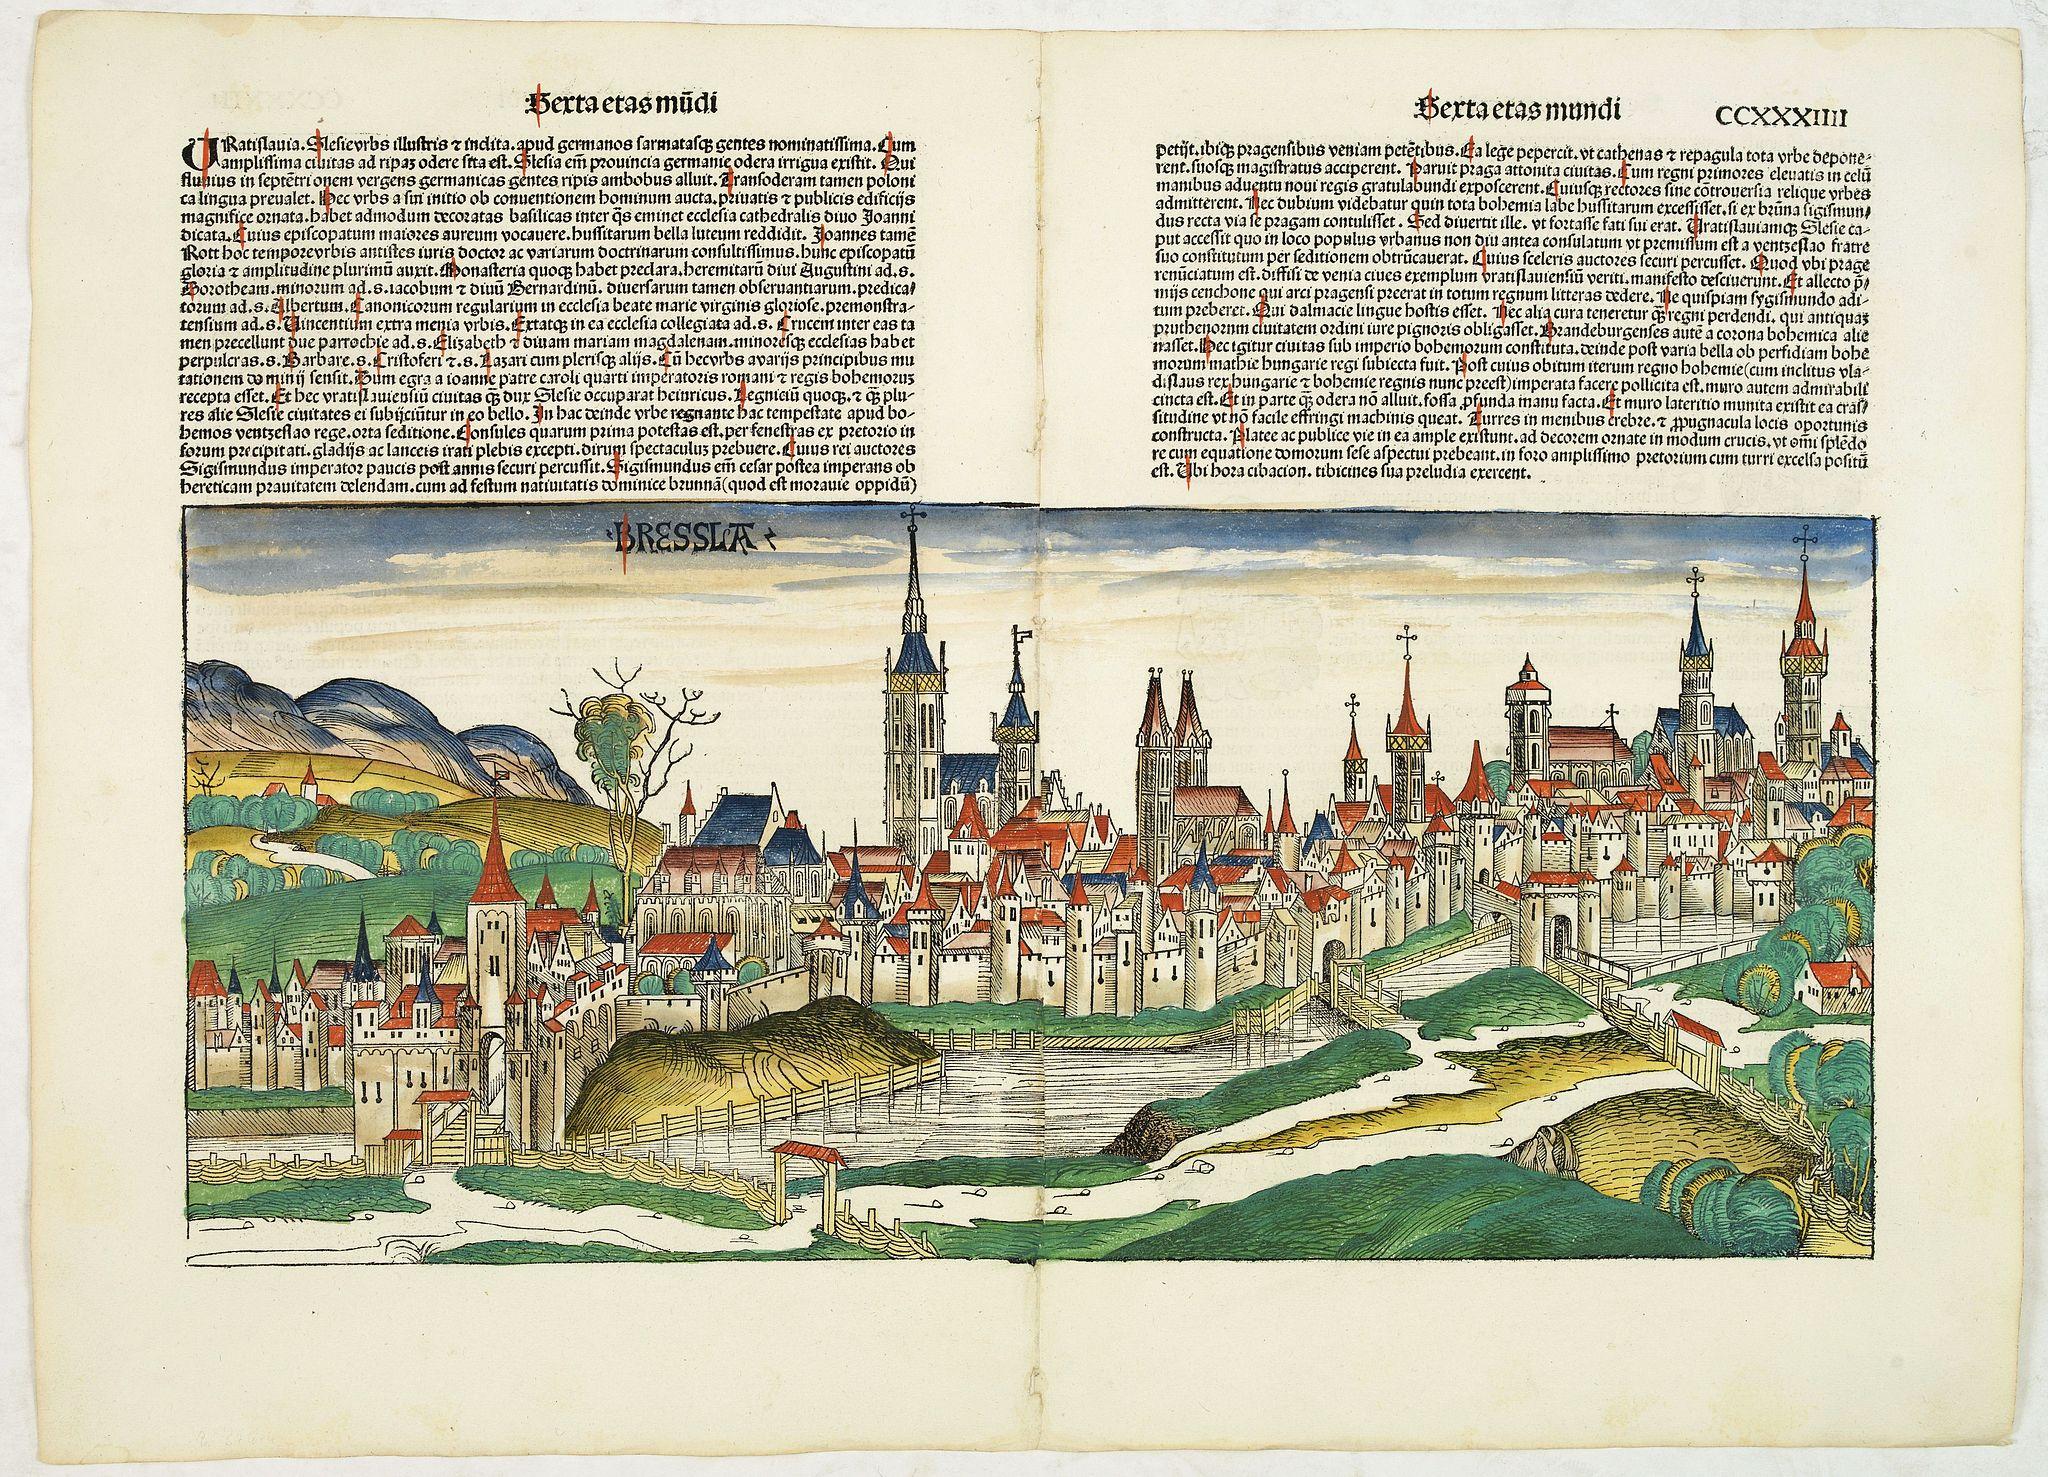 SCHEDEL, H. -  Sexta Etas Mundi. Bressla. [Breslau or Wrocław] CCXXXIIII.